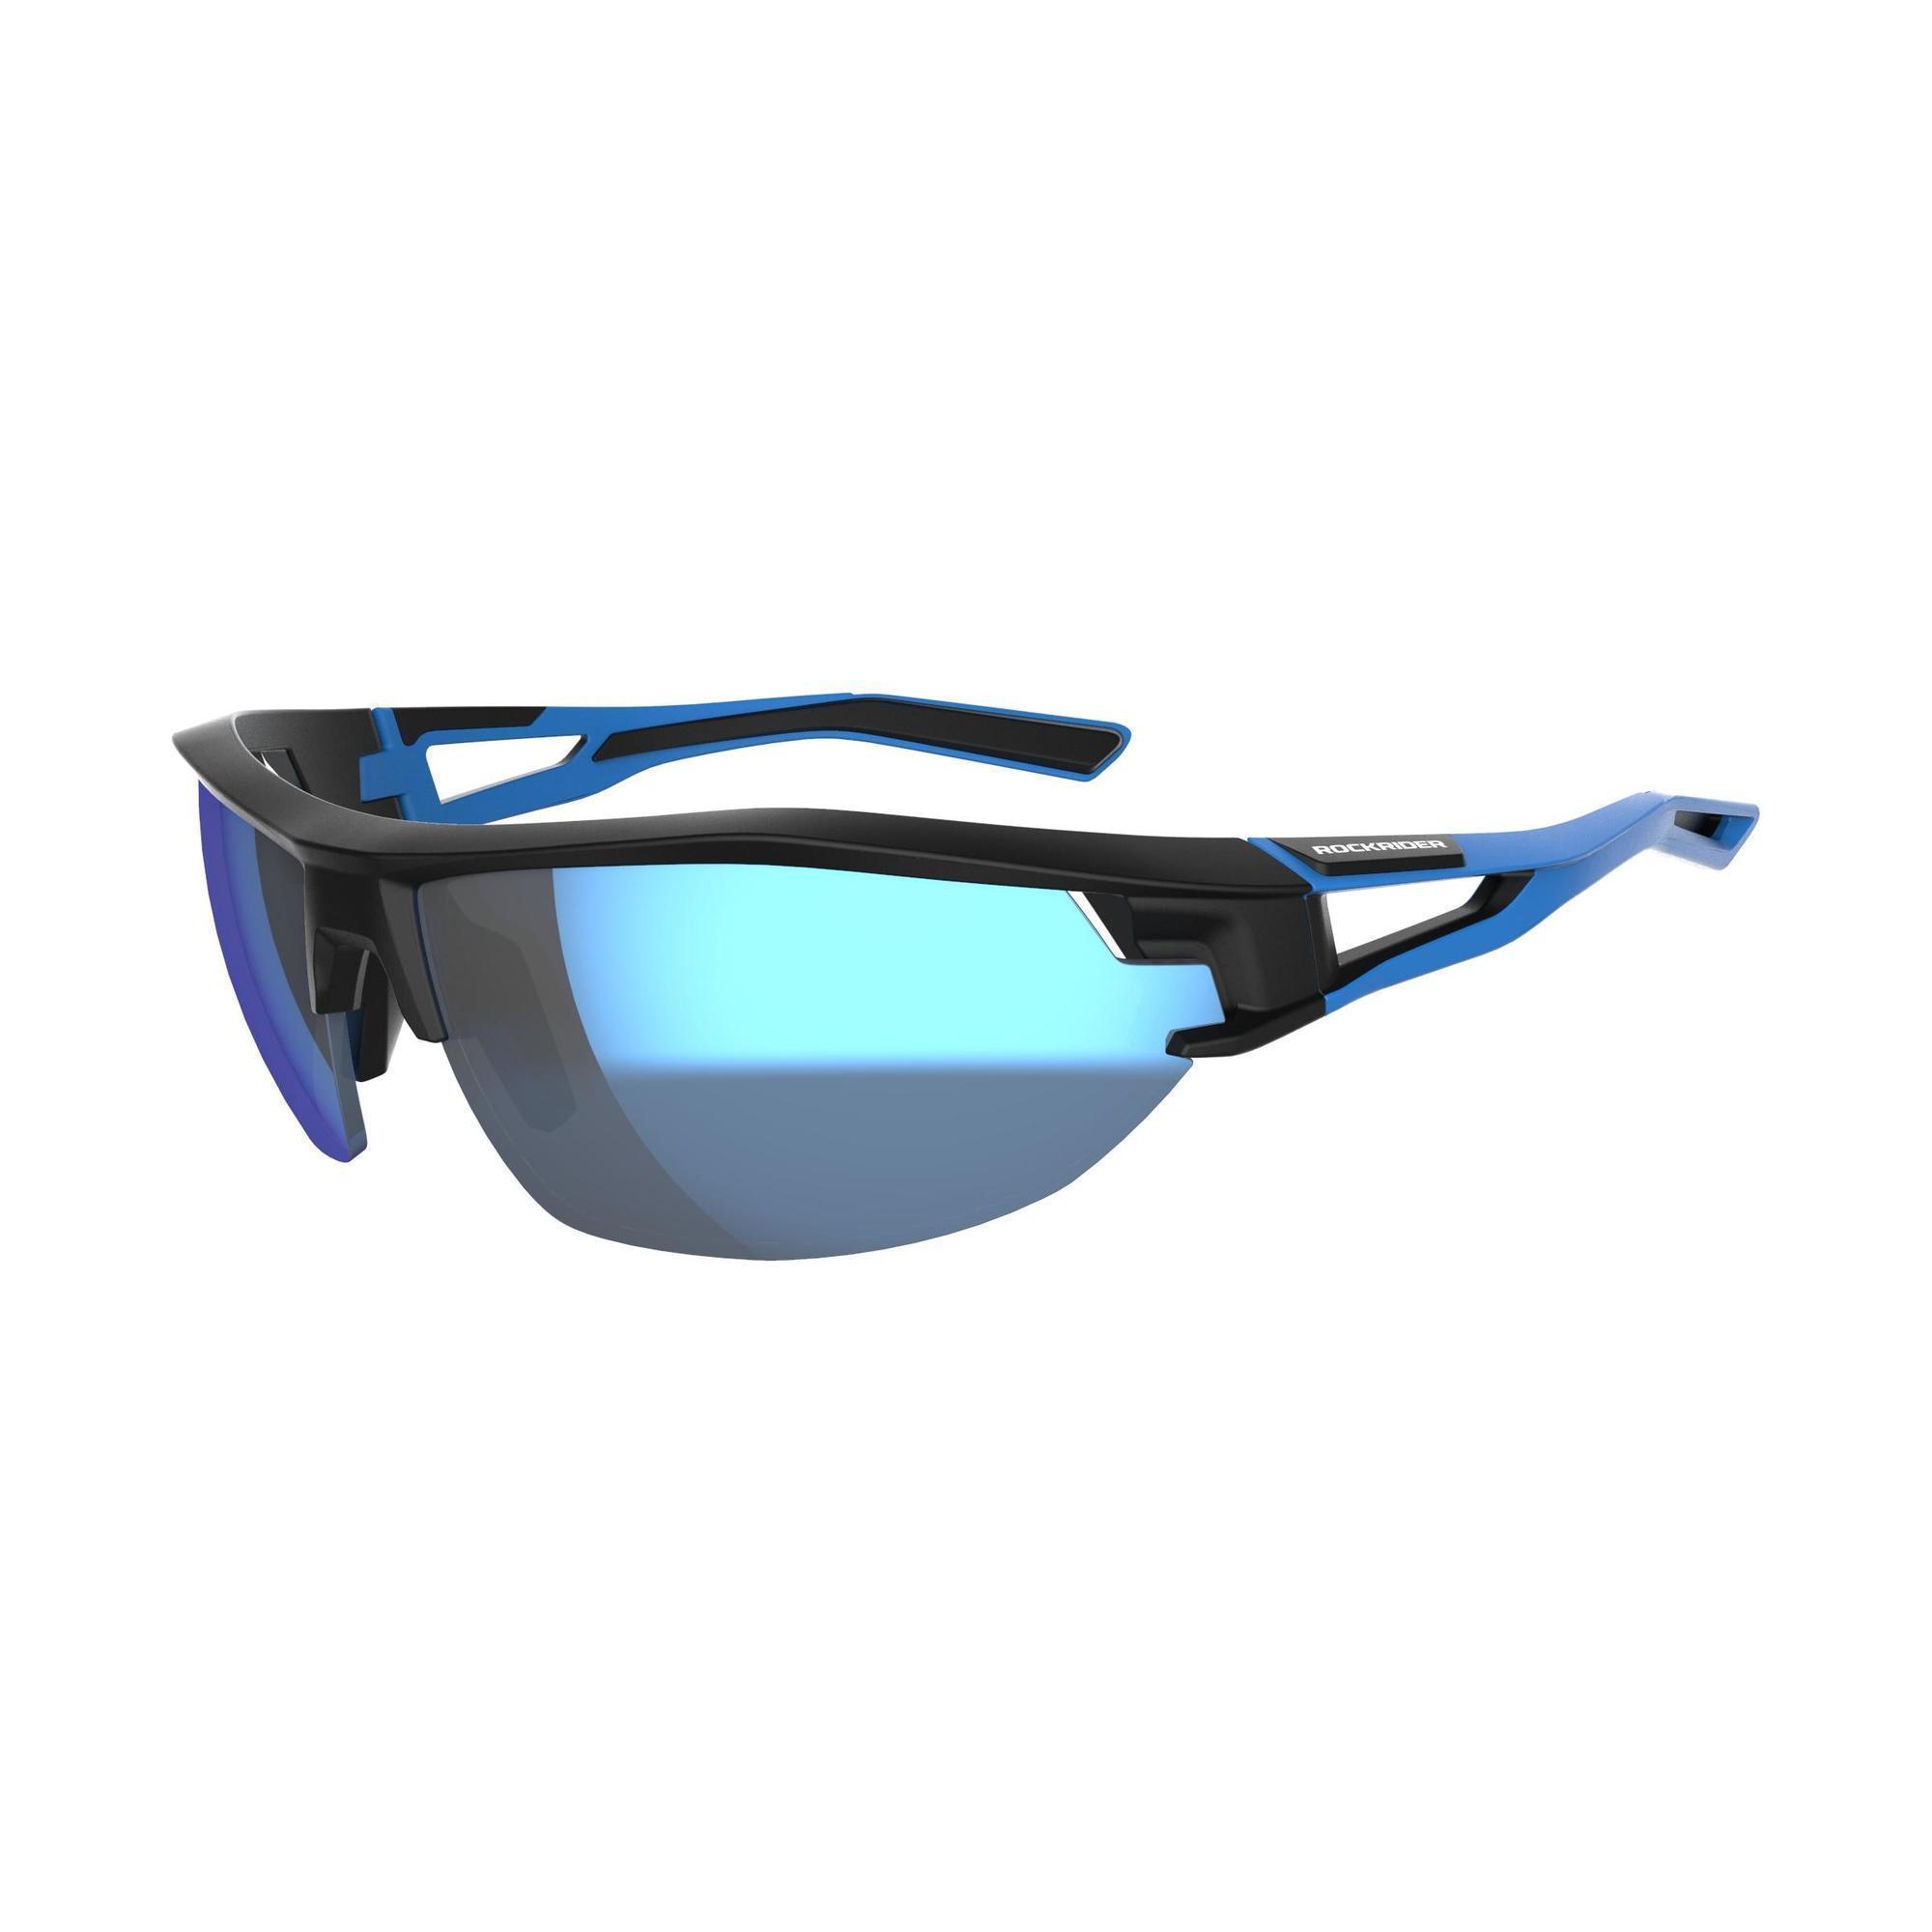 6e65d2933d62 Comprar Gafas de Running para correr